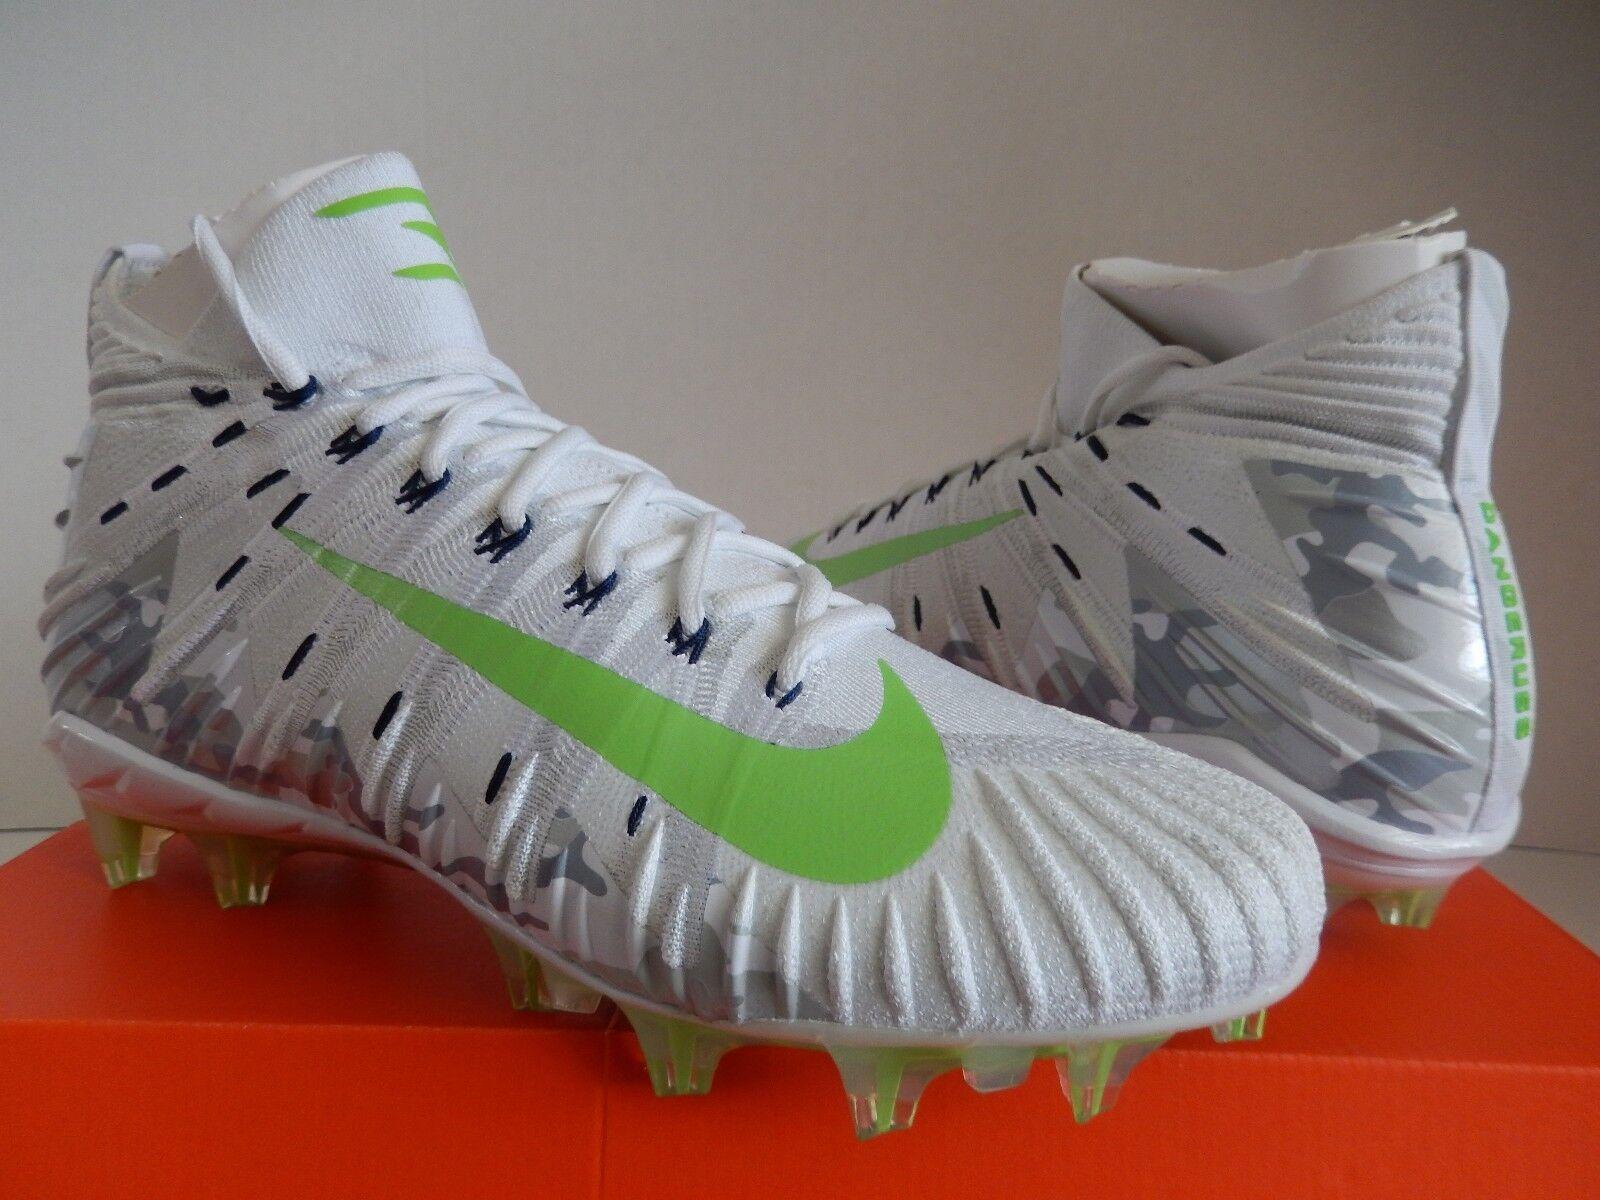 c9b0aabd53c Nike Alpha Menace Elite Russell Wilson Cleat Size 12.5 W  Autograph ...